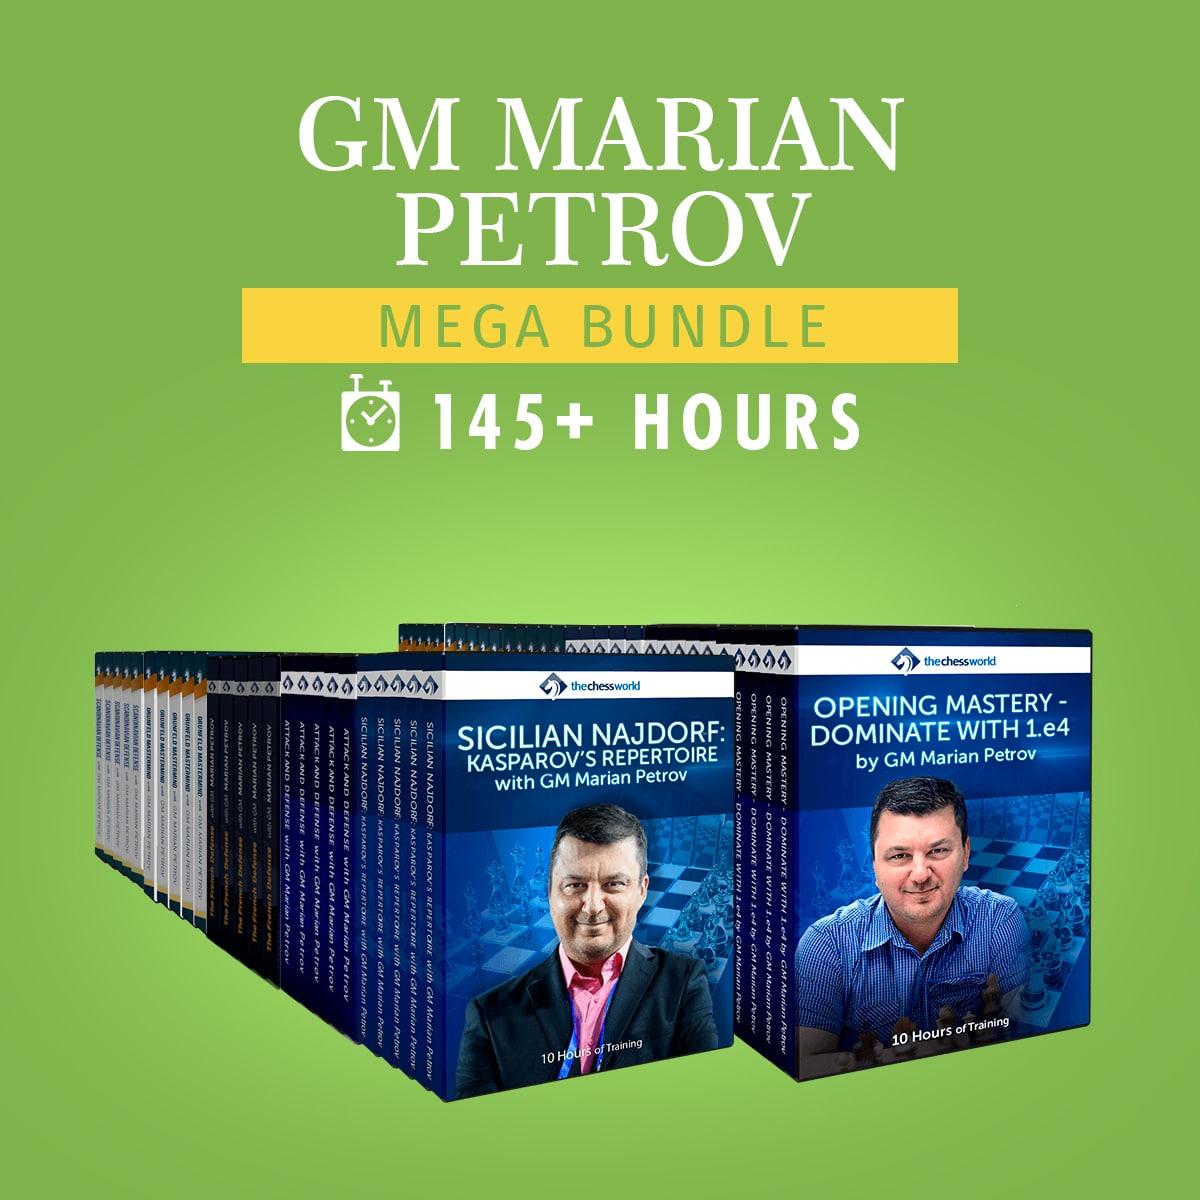 GM Marian Petrov Mega Bundle